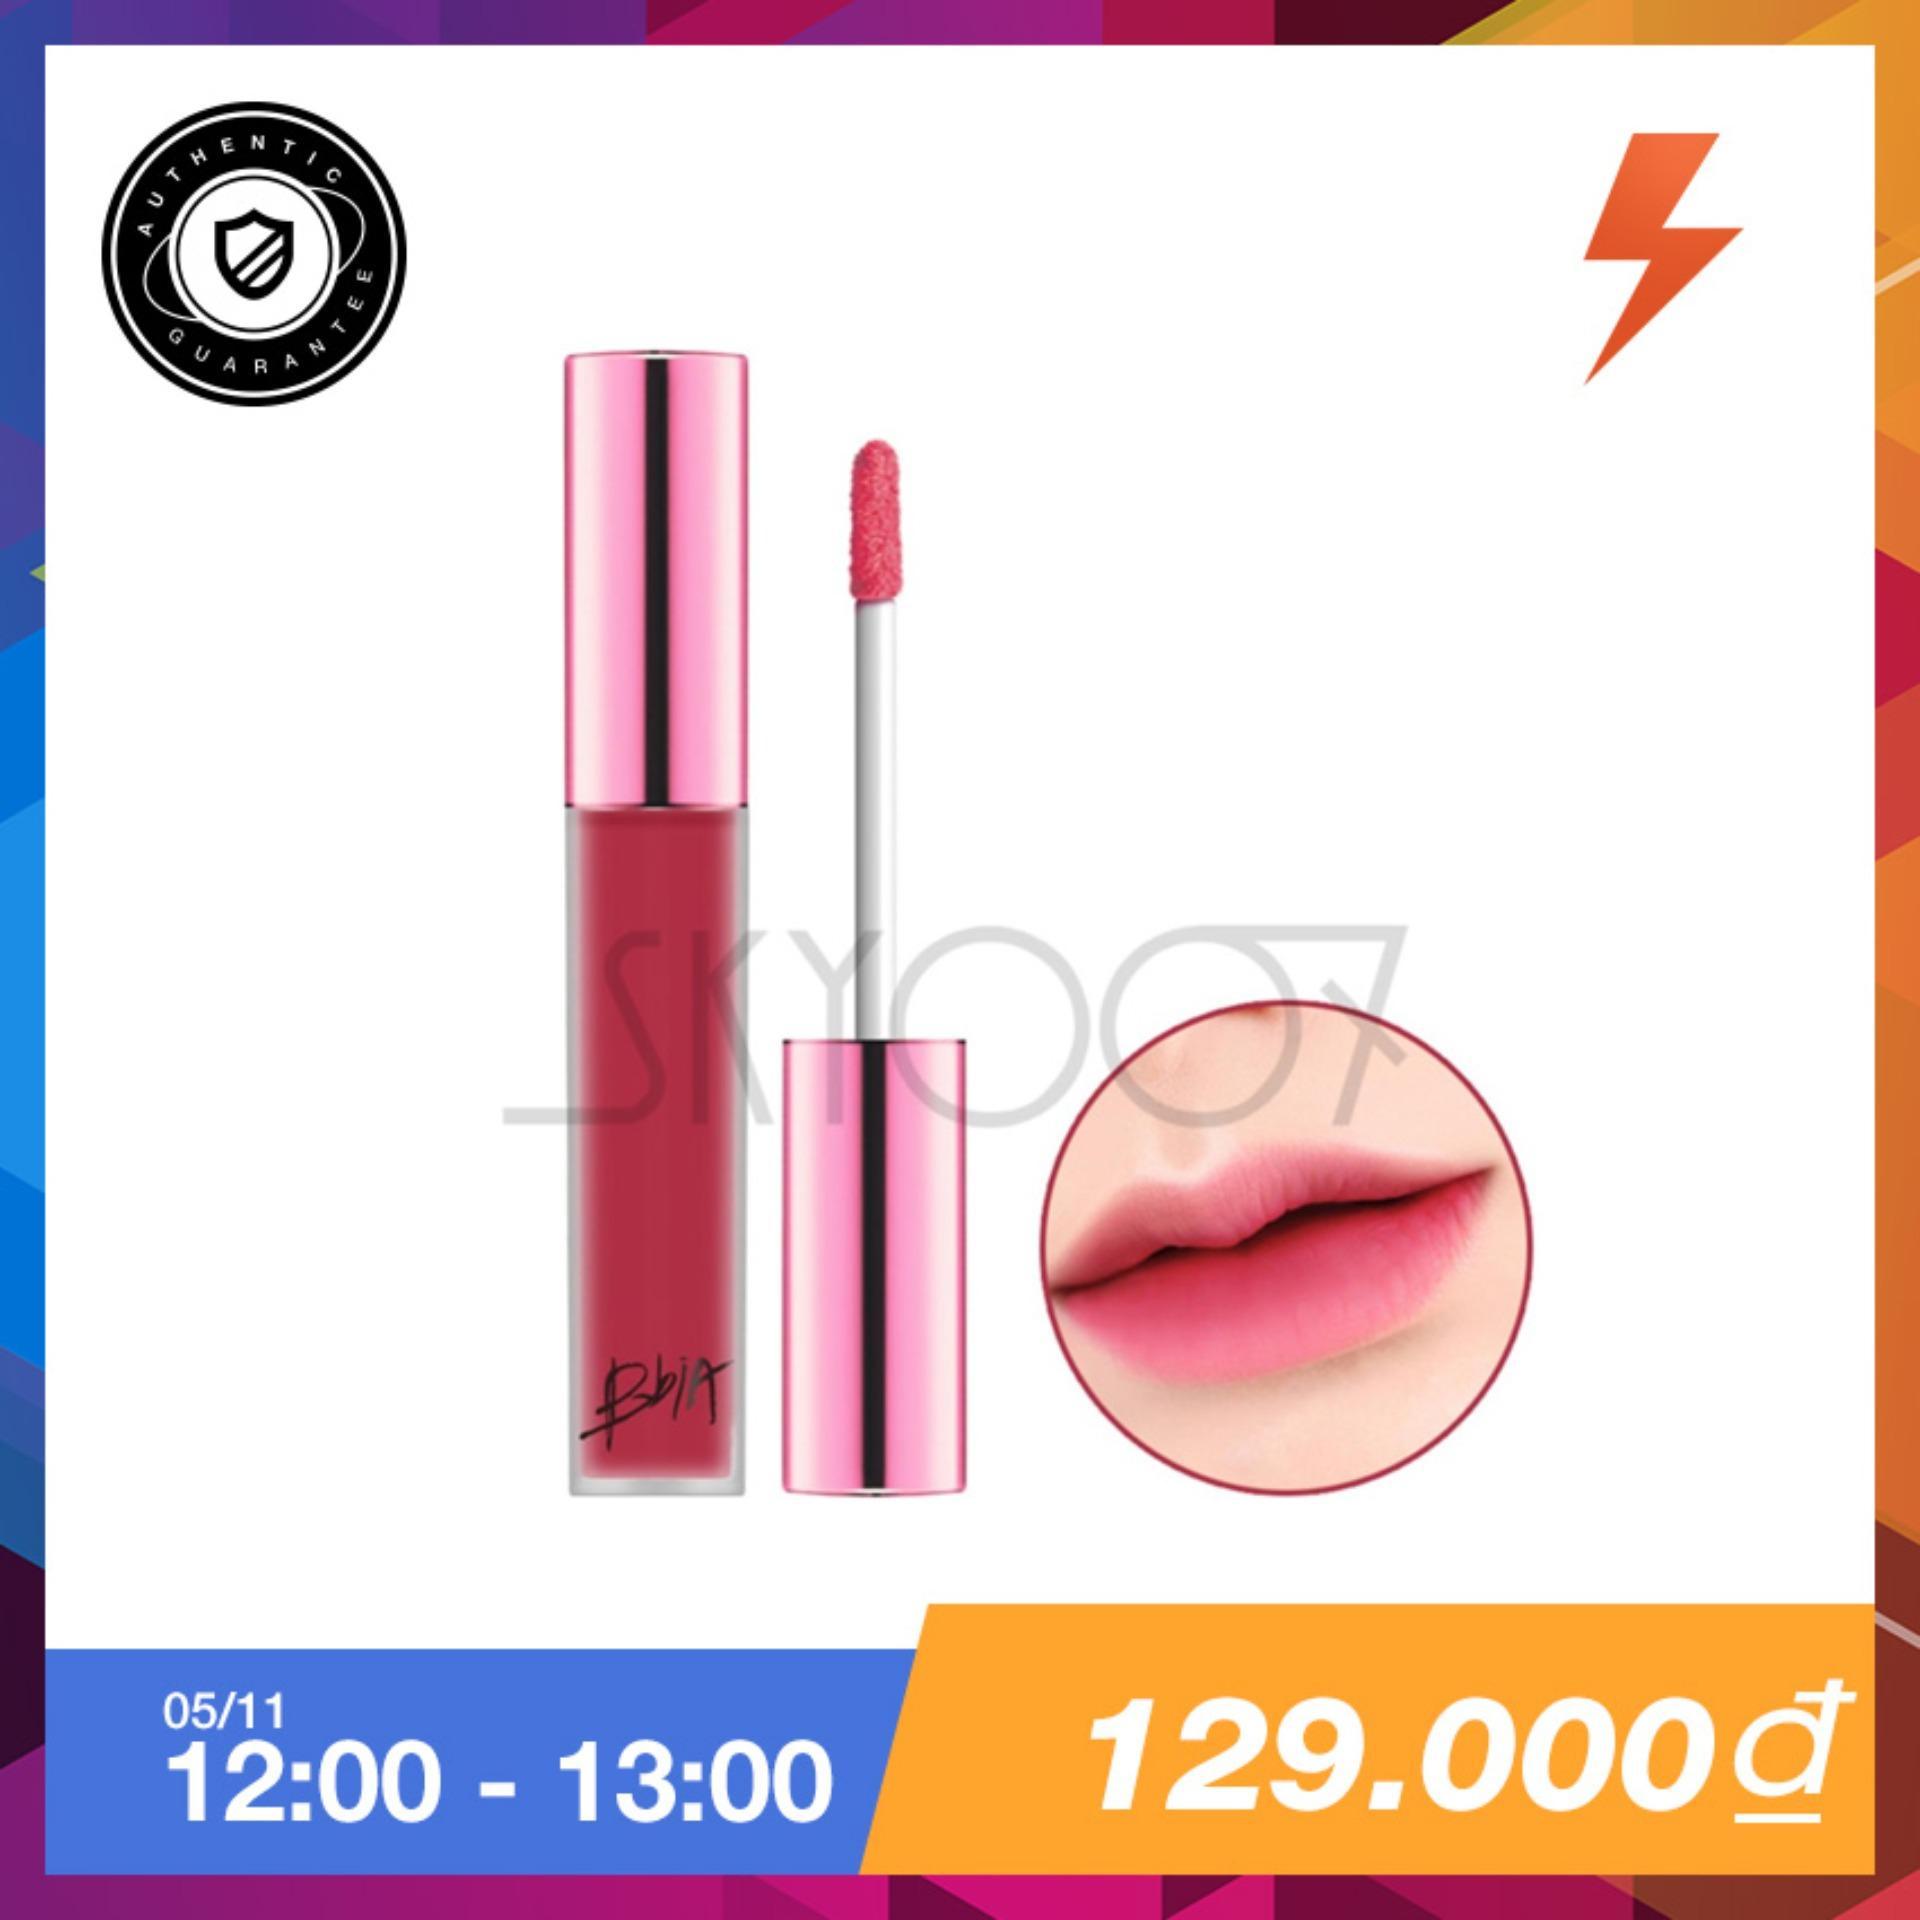 Giá Bán Son Kem Li Sieu Lau Troi Bbia Last Velvet Lip Tint Version 2 09 Rose Attack Mau Hồng Đất Rẻ